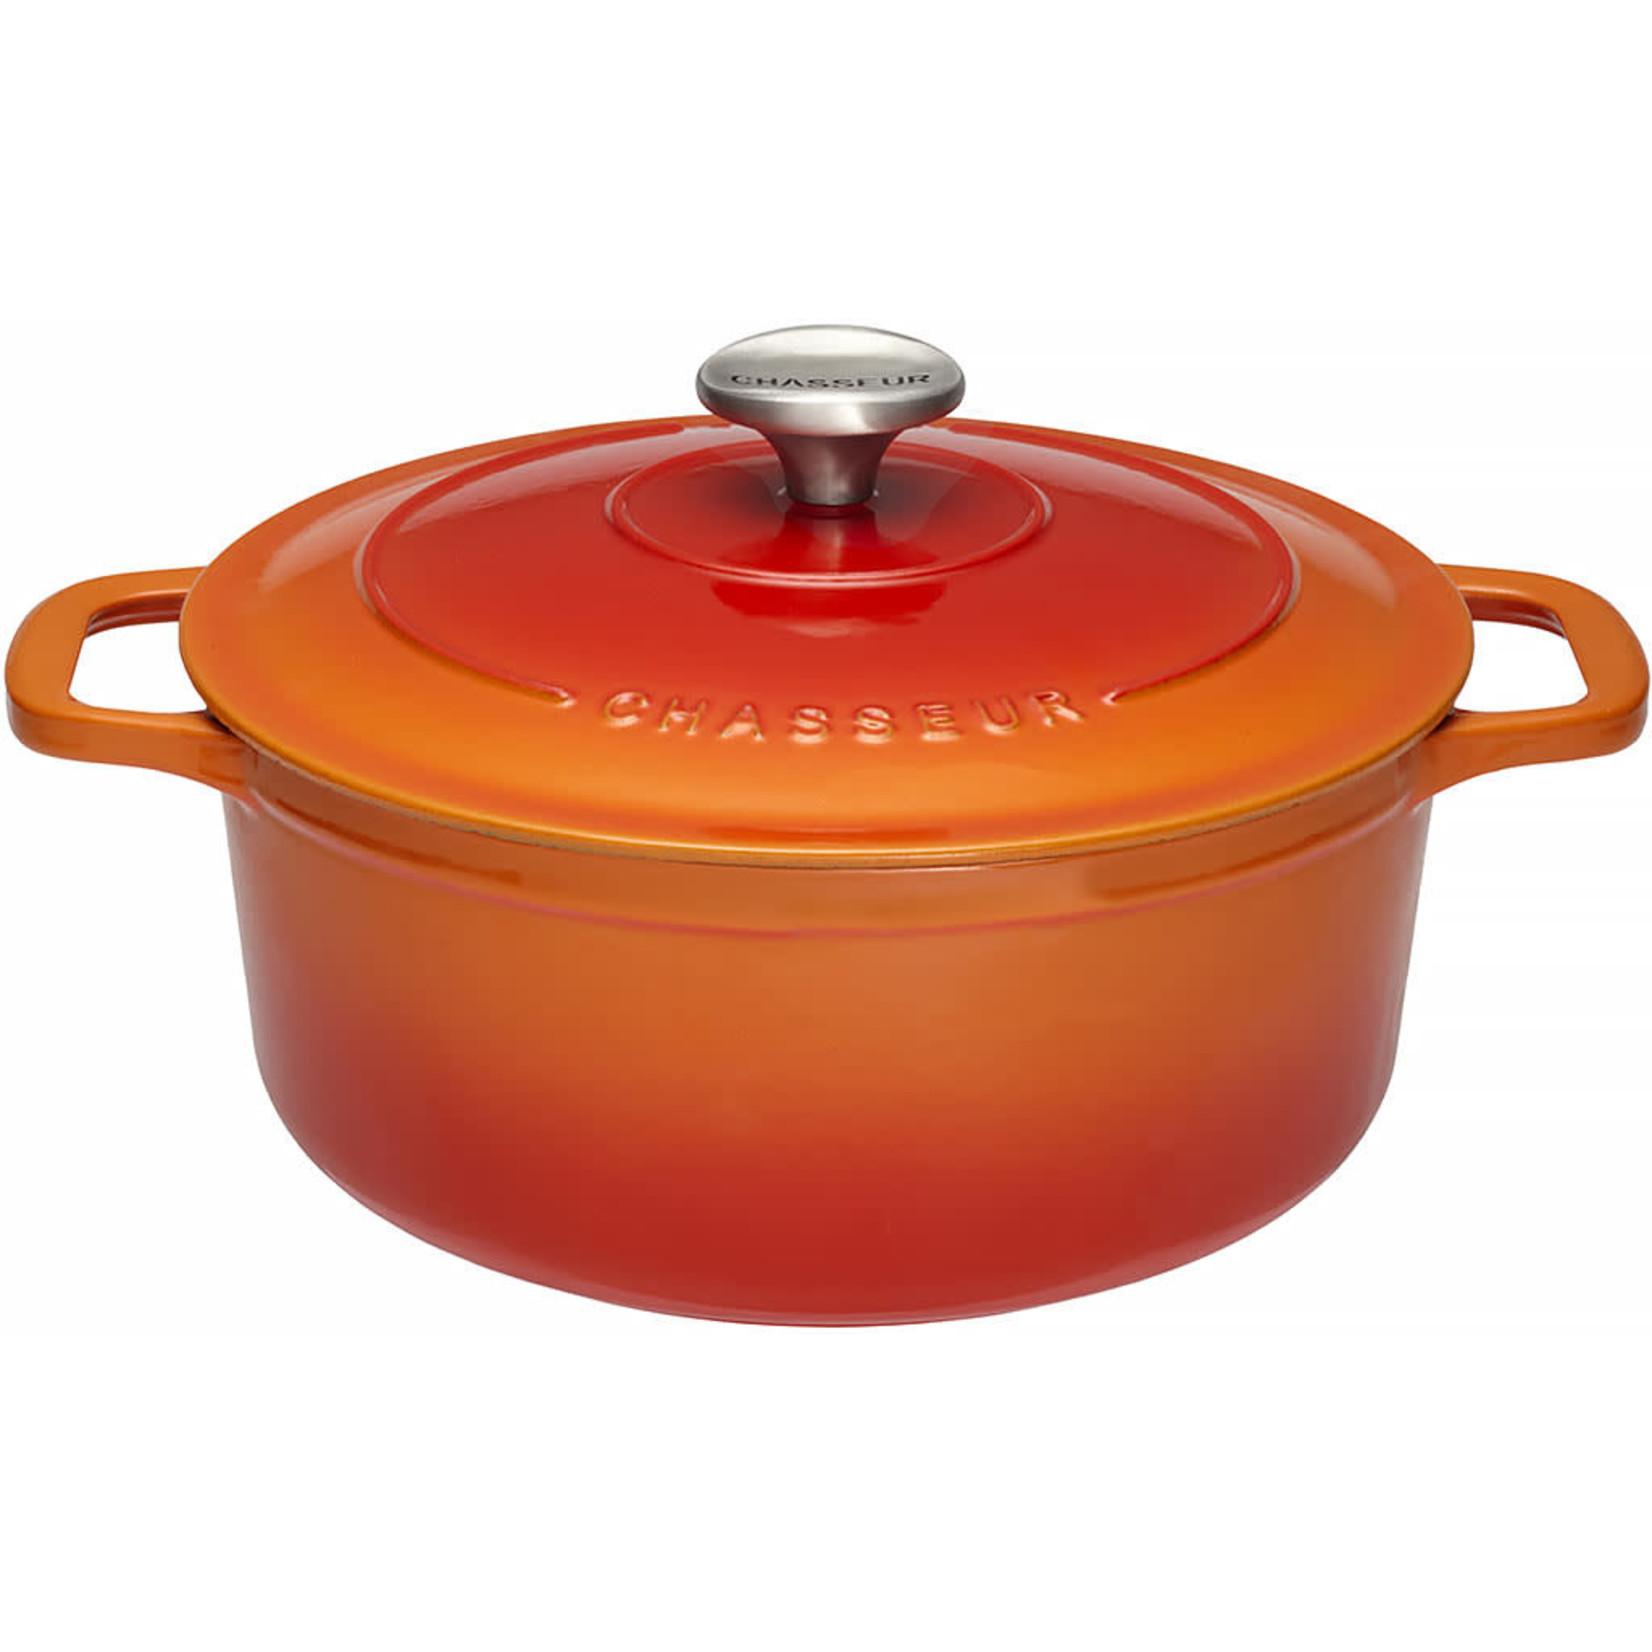 Chasseur Cocotte rond 28cm 6,1L oranje